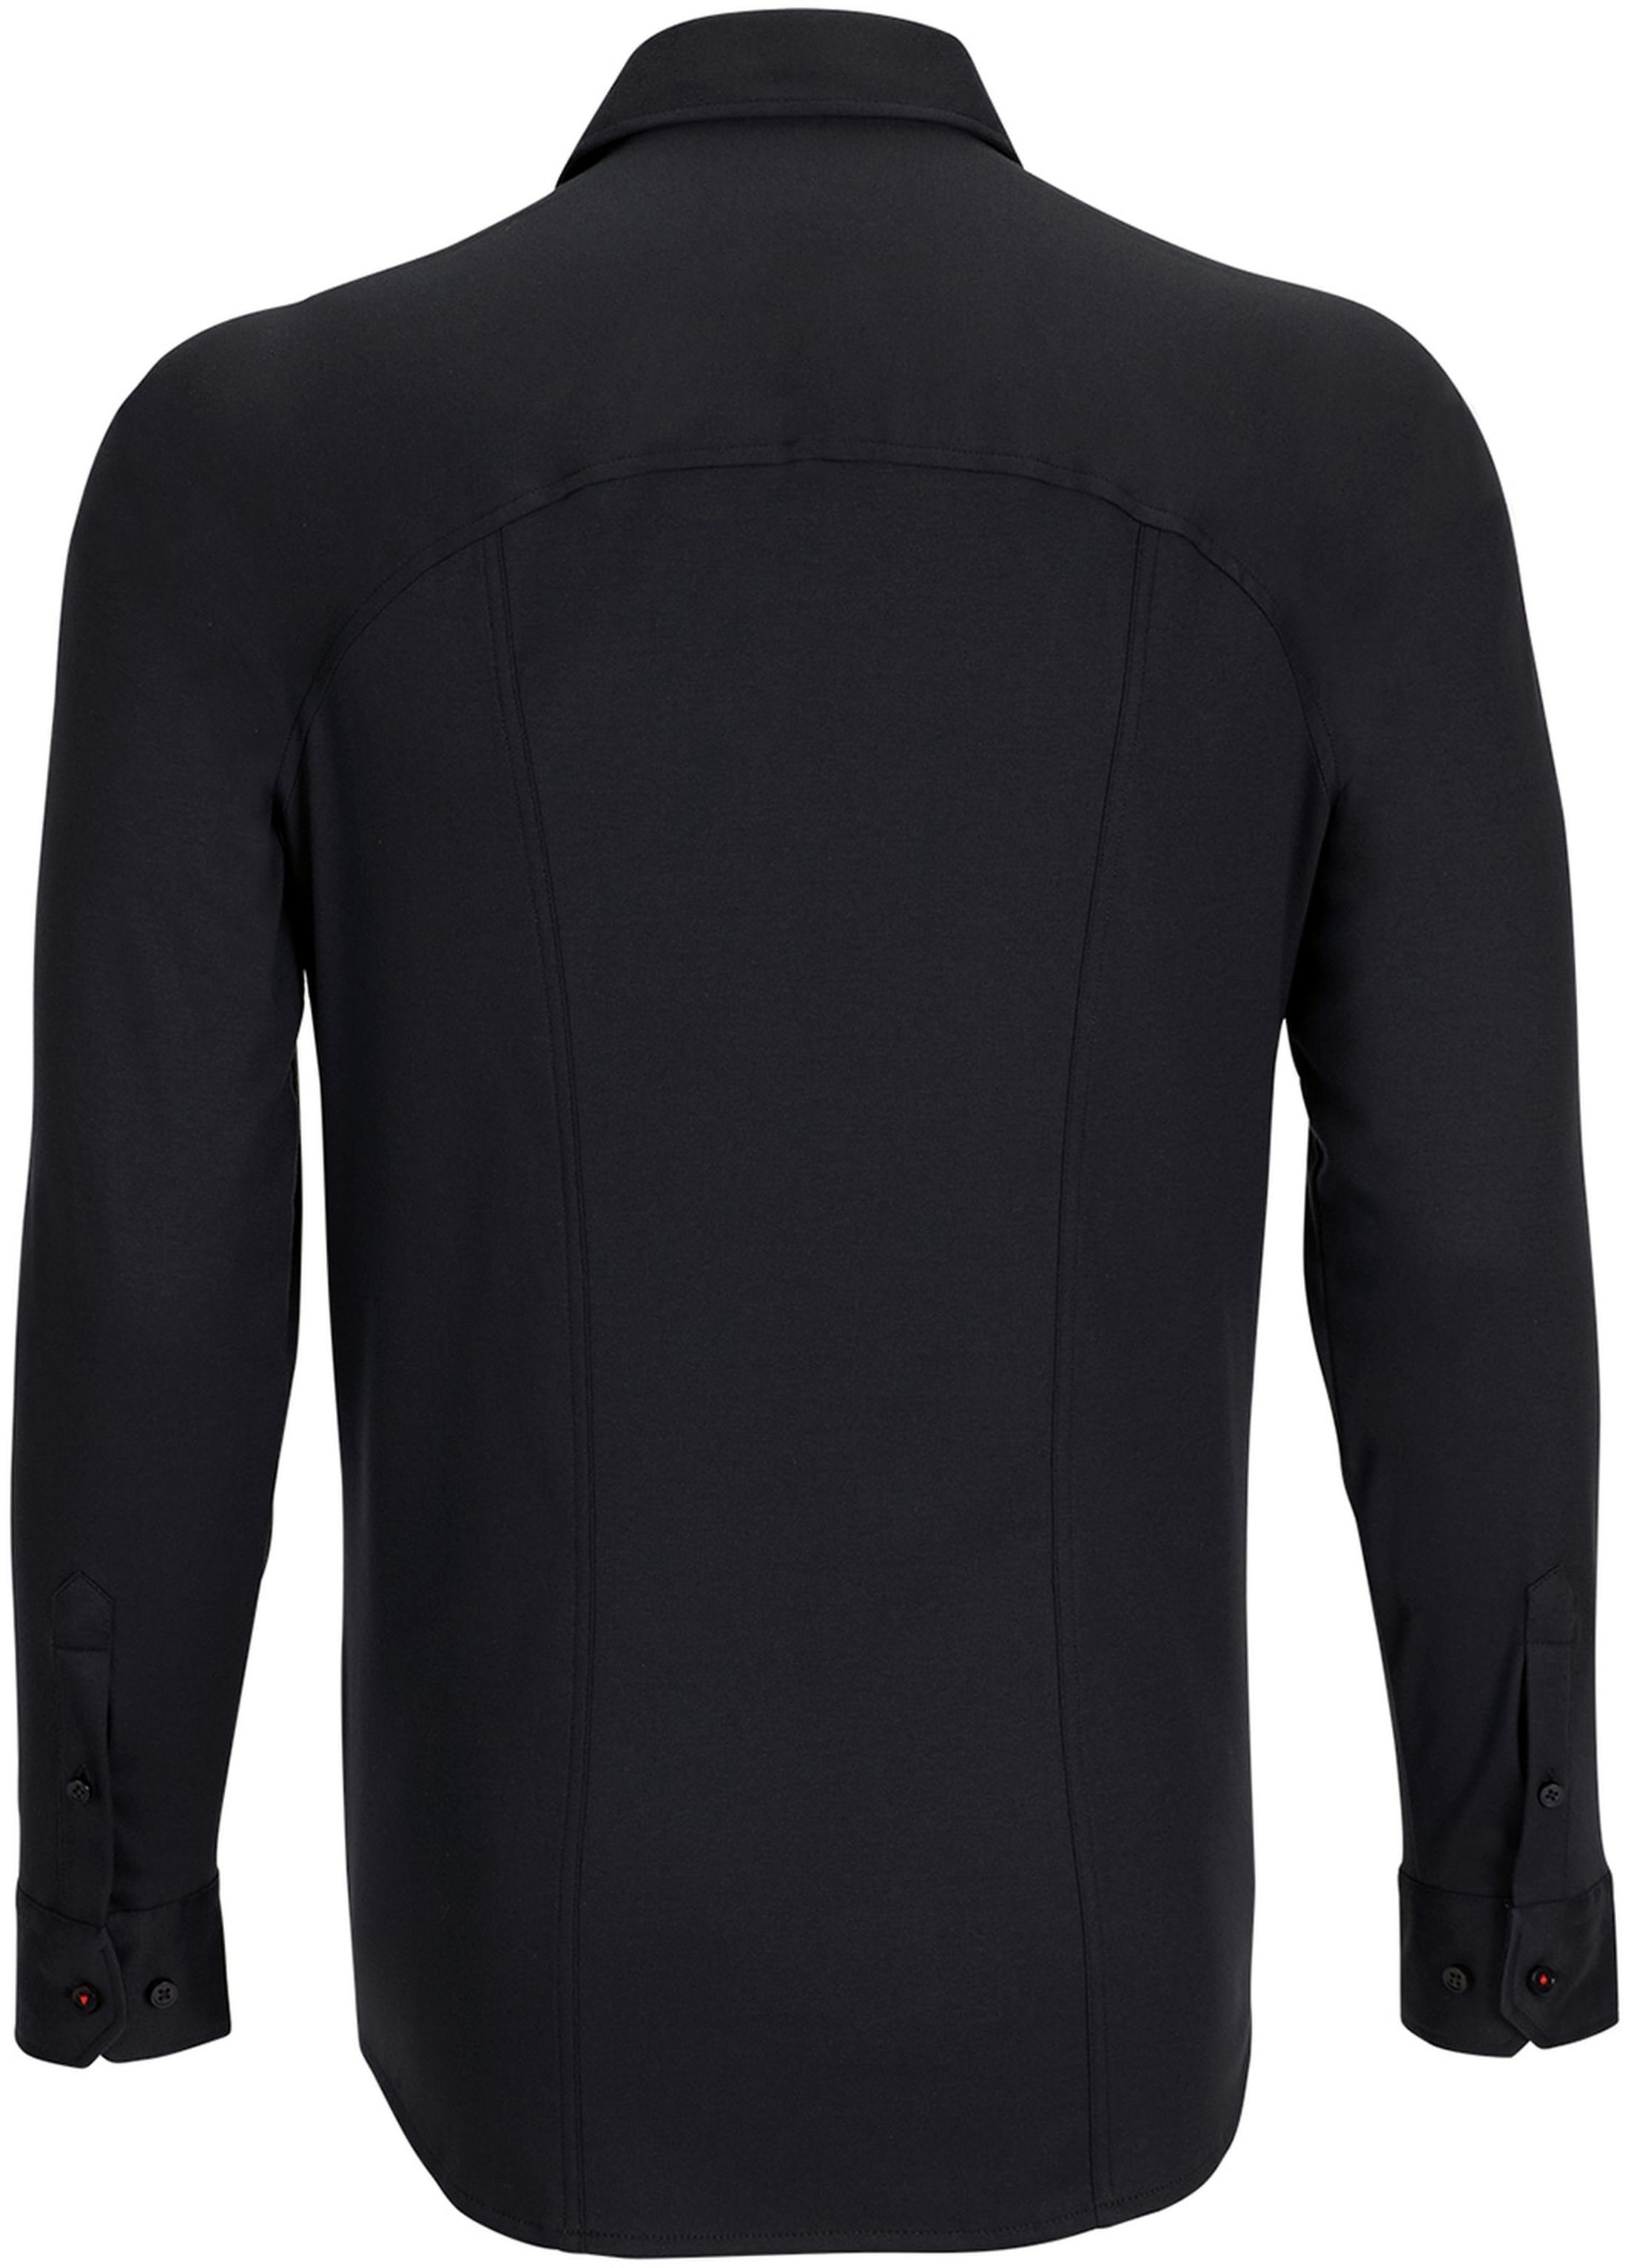 Desoto Shirt Non Iron Black foto 1